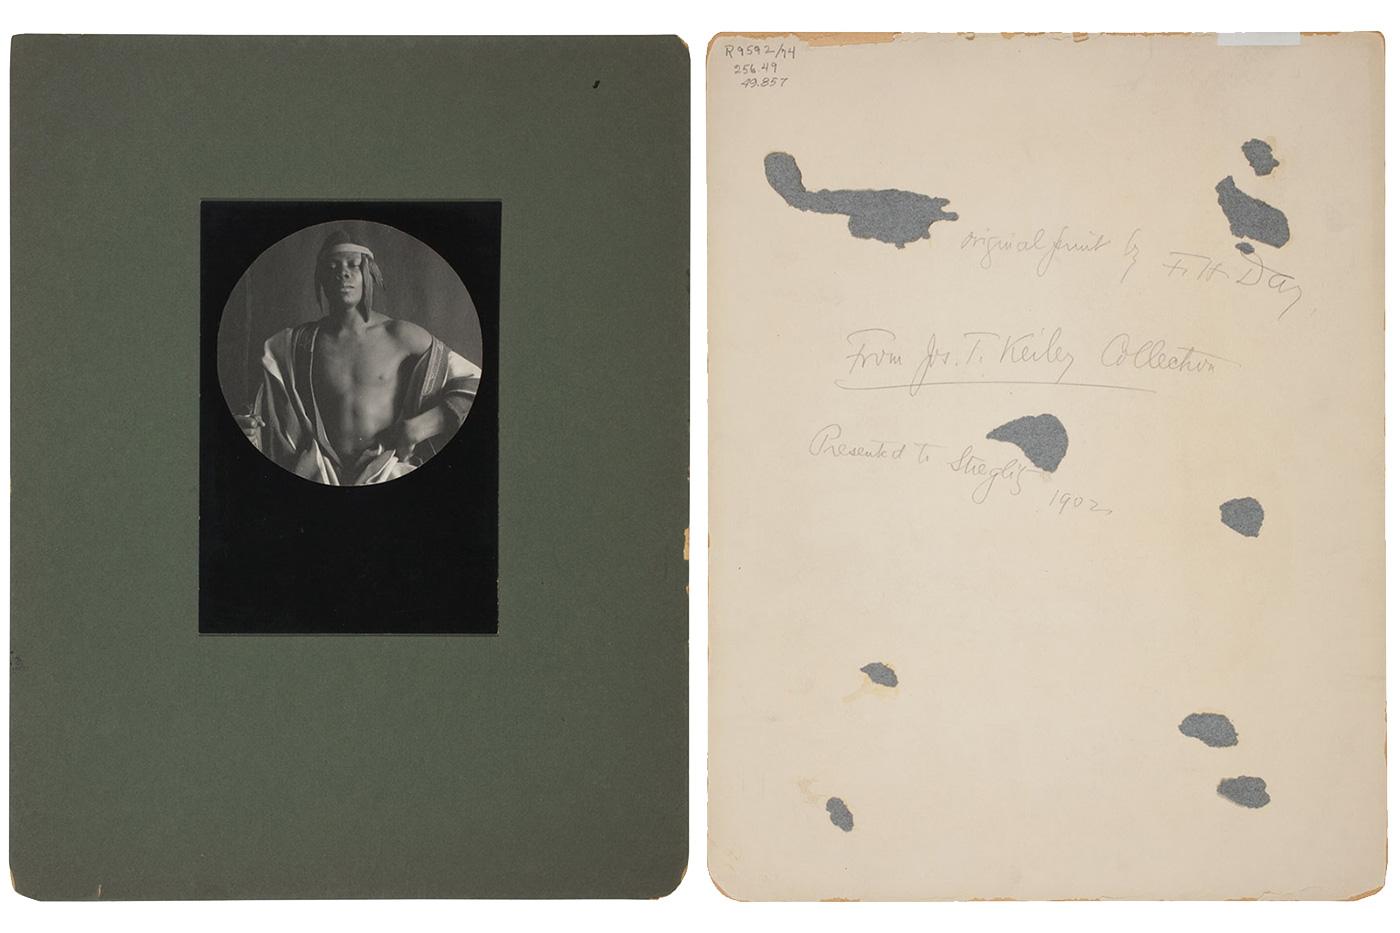 Recto and verso of a 1902 photograph of an Ethiopian Monarch